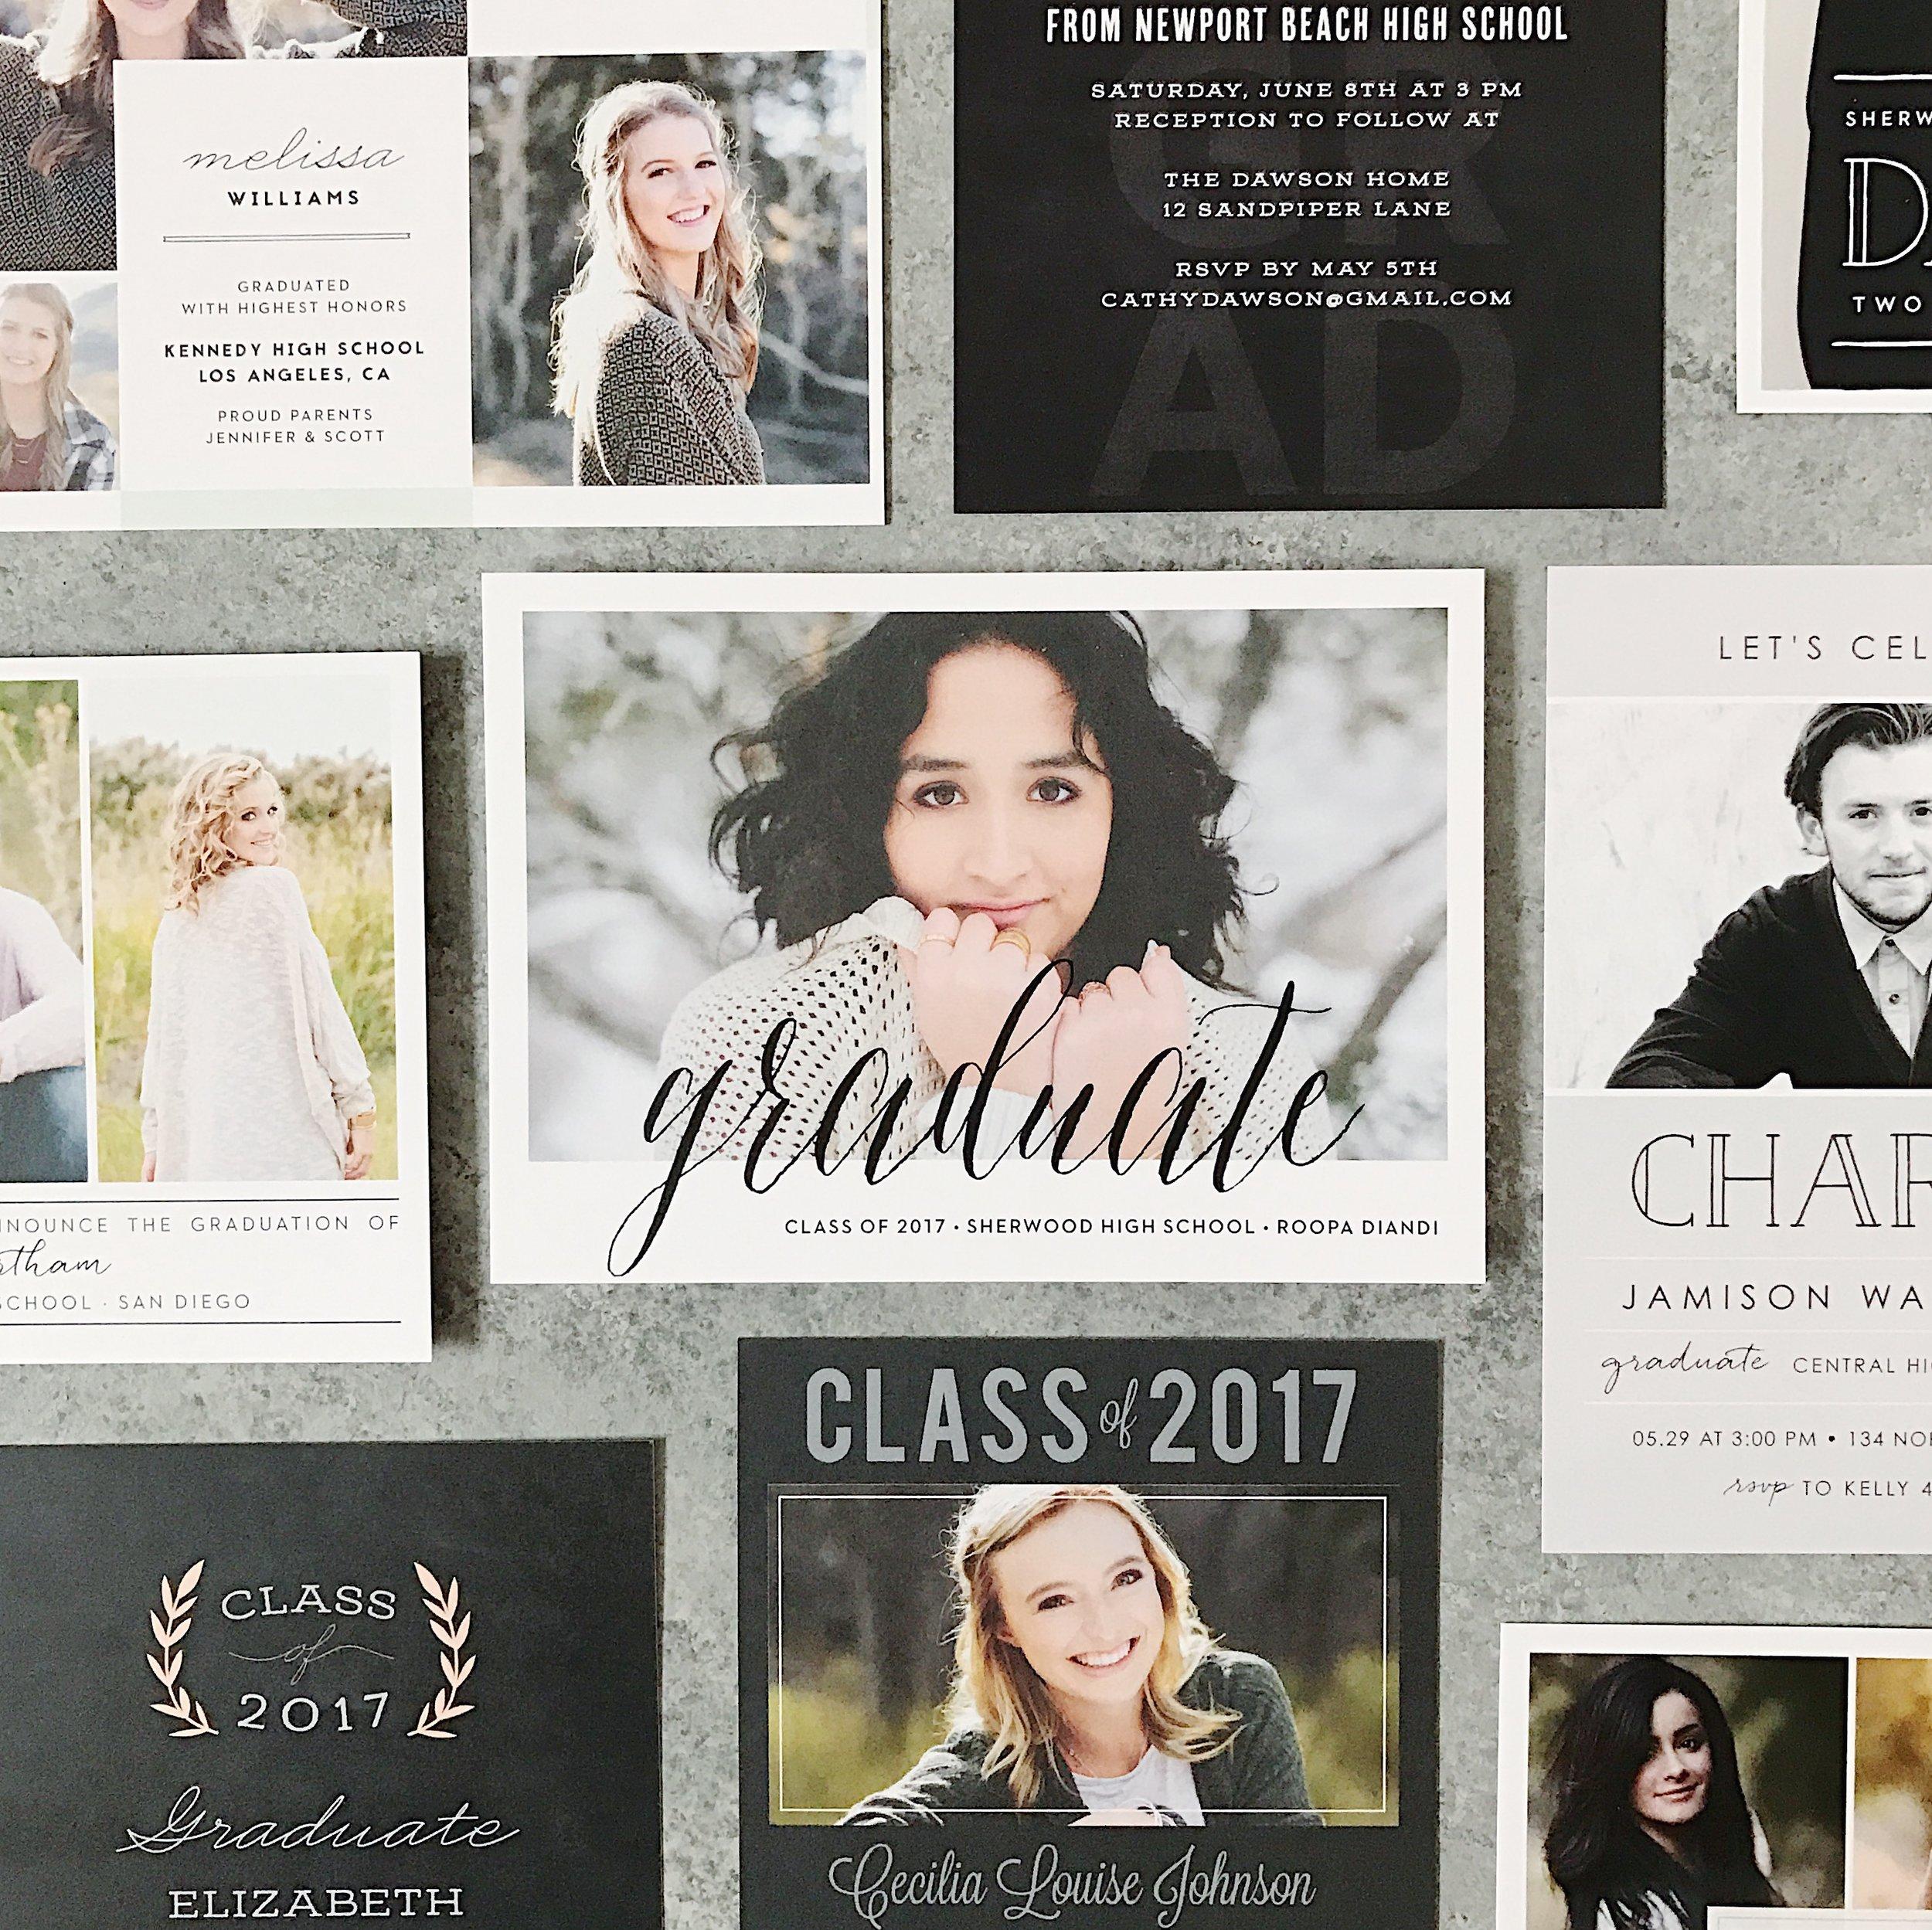 Basic_Invite_Graduation_announcements_and_invitations_5.jpg